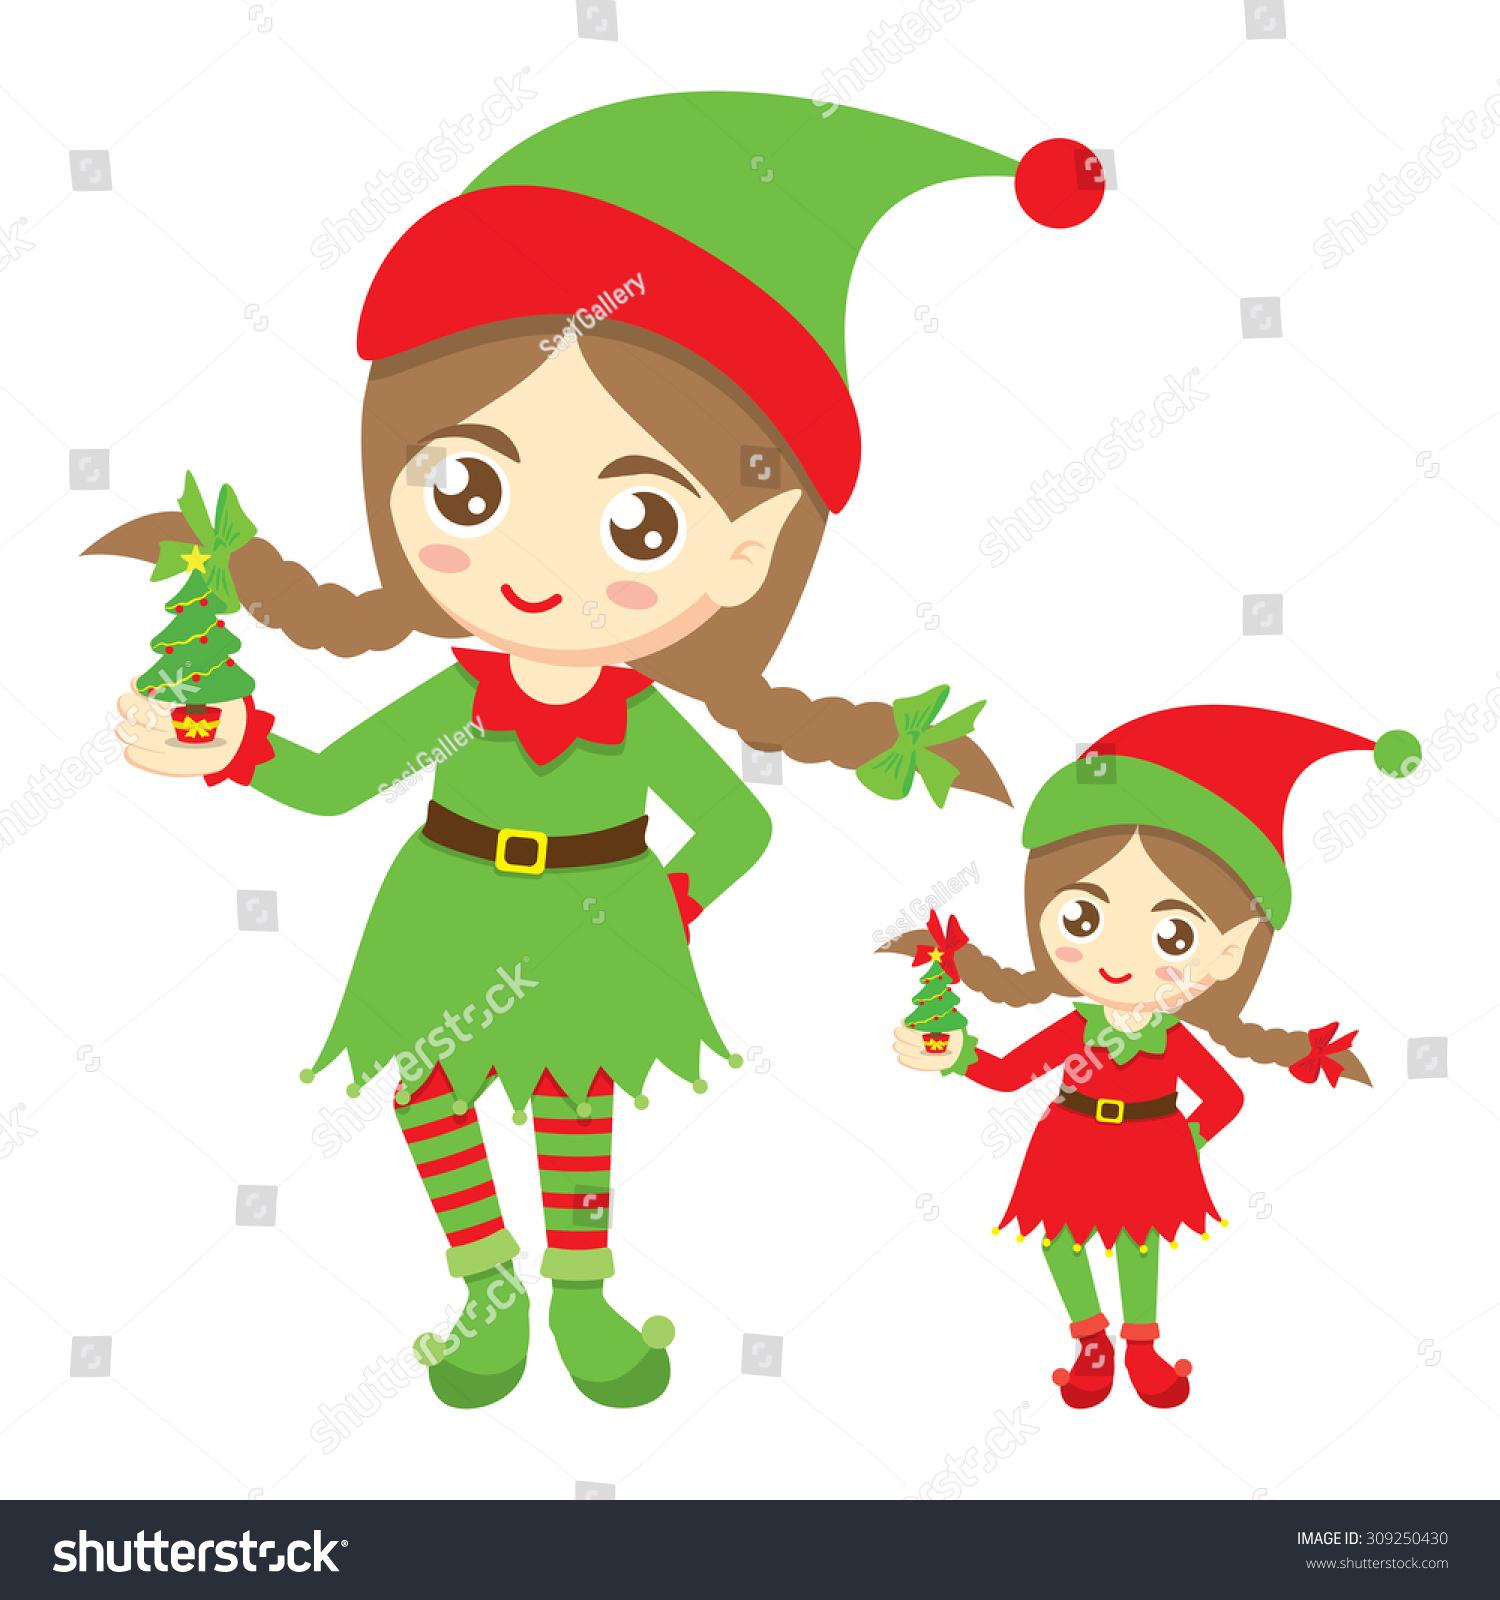 elf for christmas - girl elf & magical reward kit